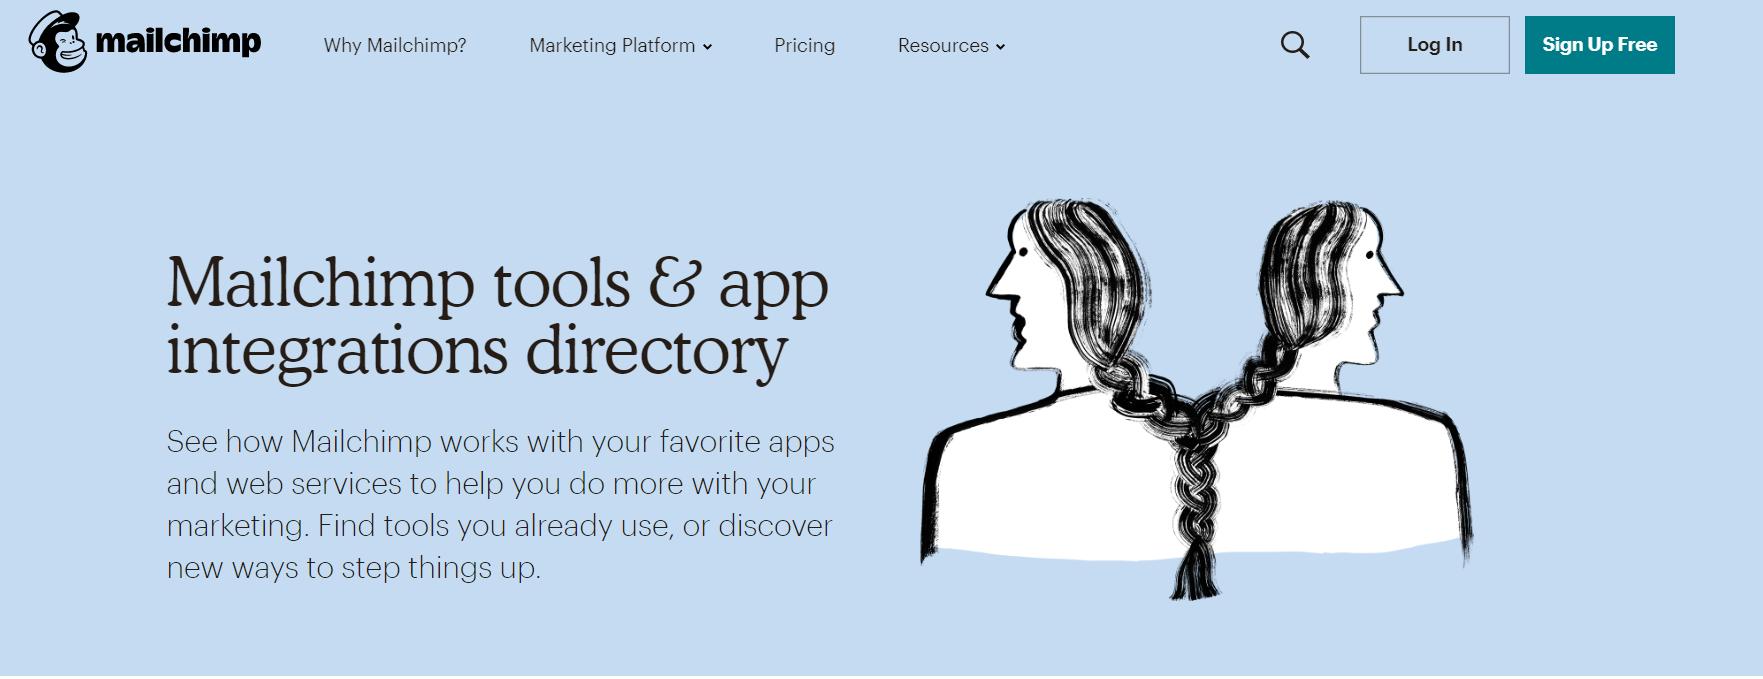 Mailchimp-Tools-Apps-Integration-Directory